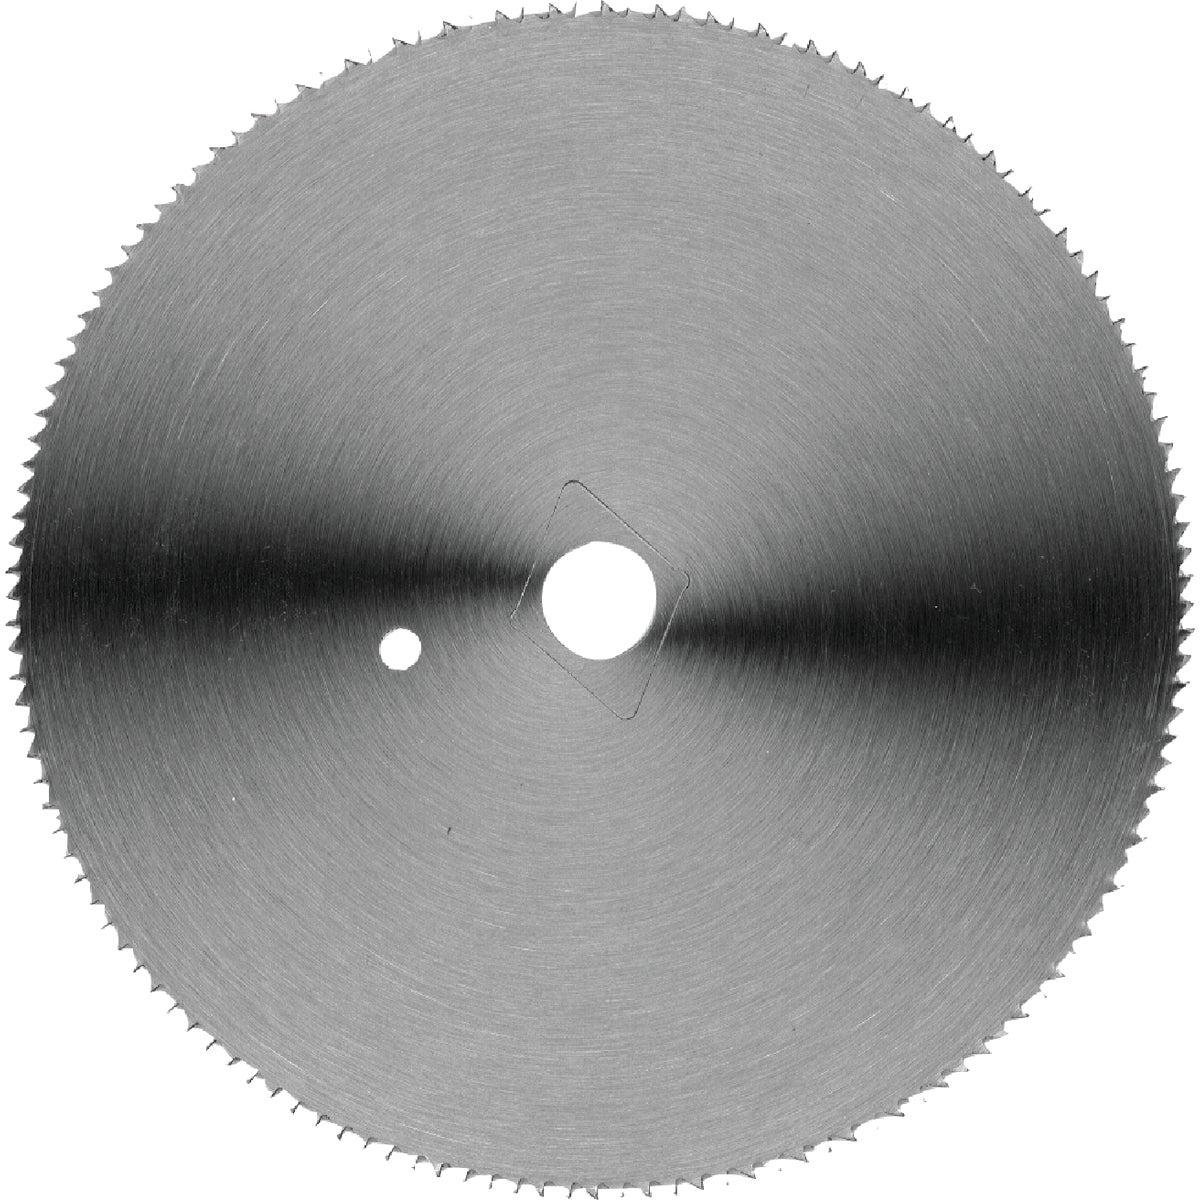 "6-1/2"" PLYWOOD BLADE - 11820ZR by Irwin Industr Tool"